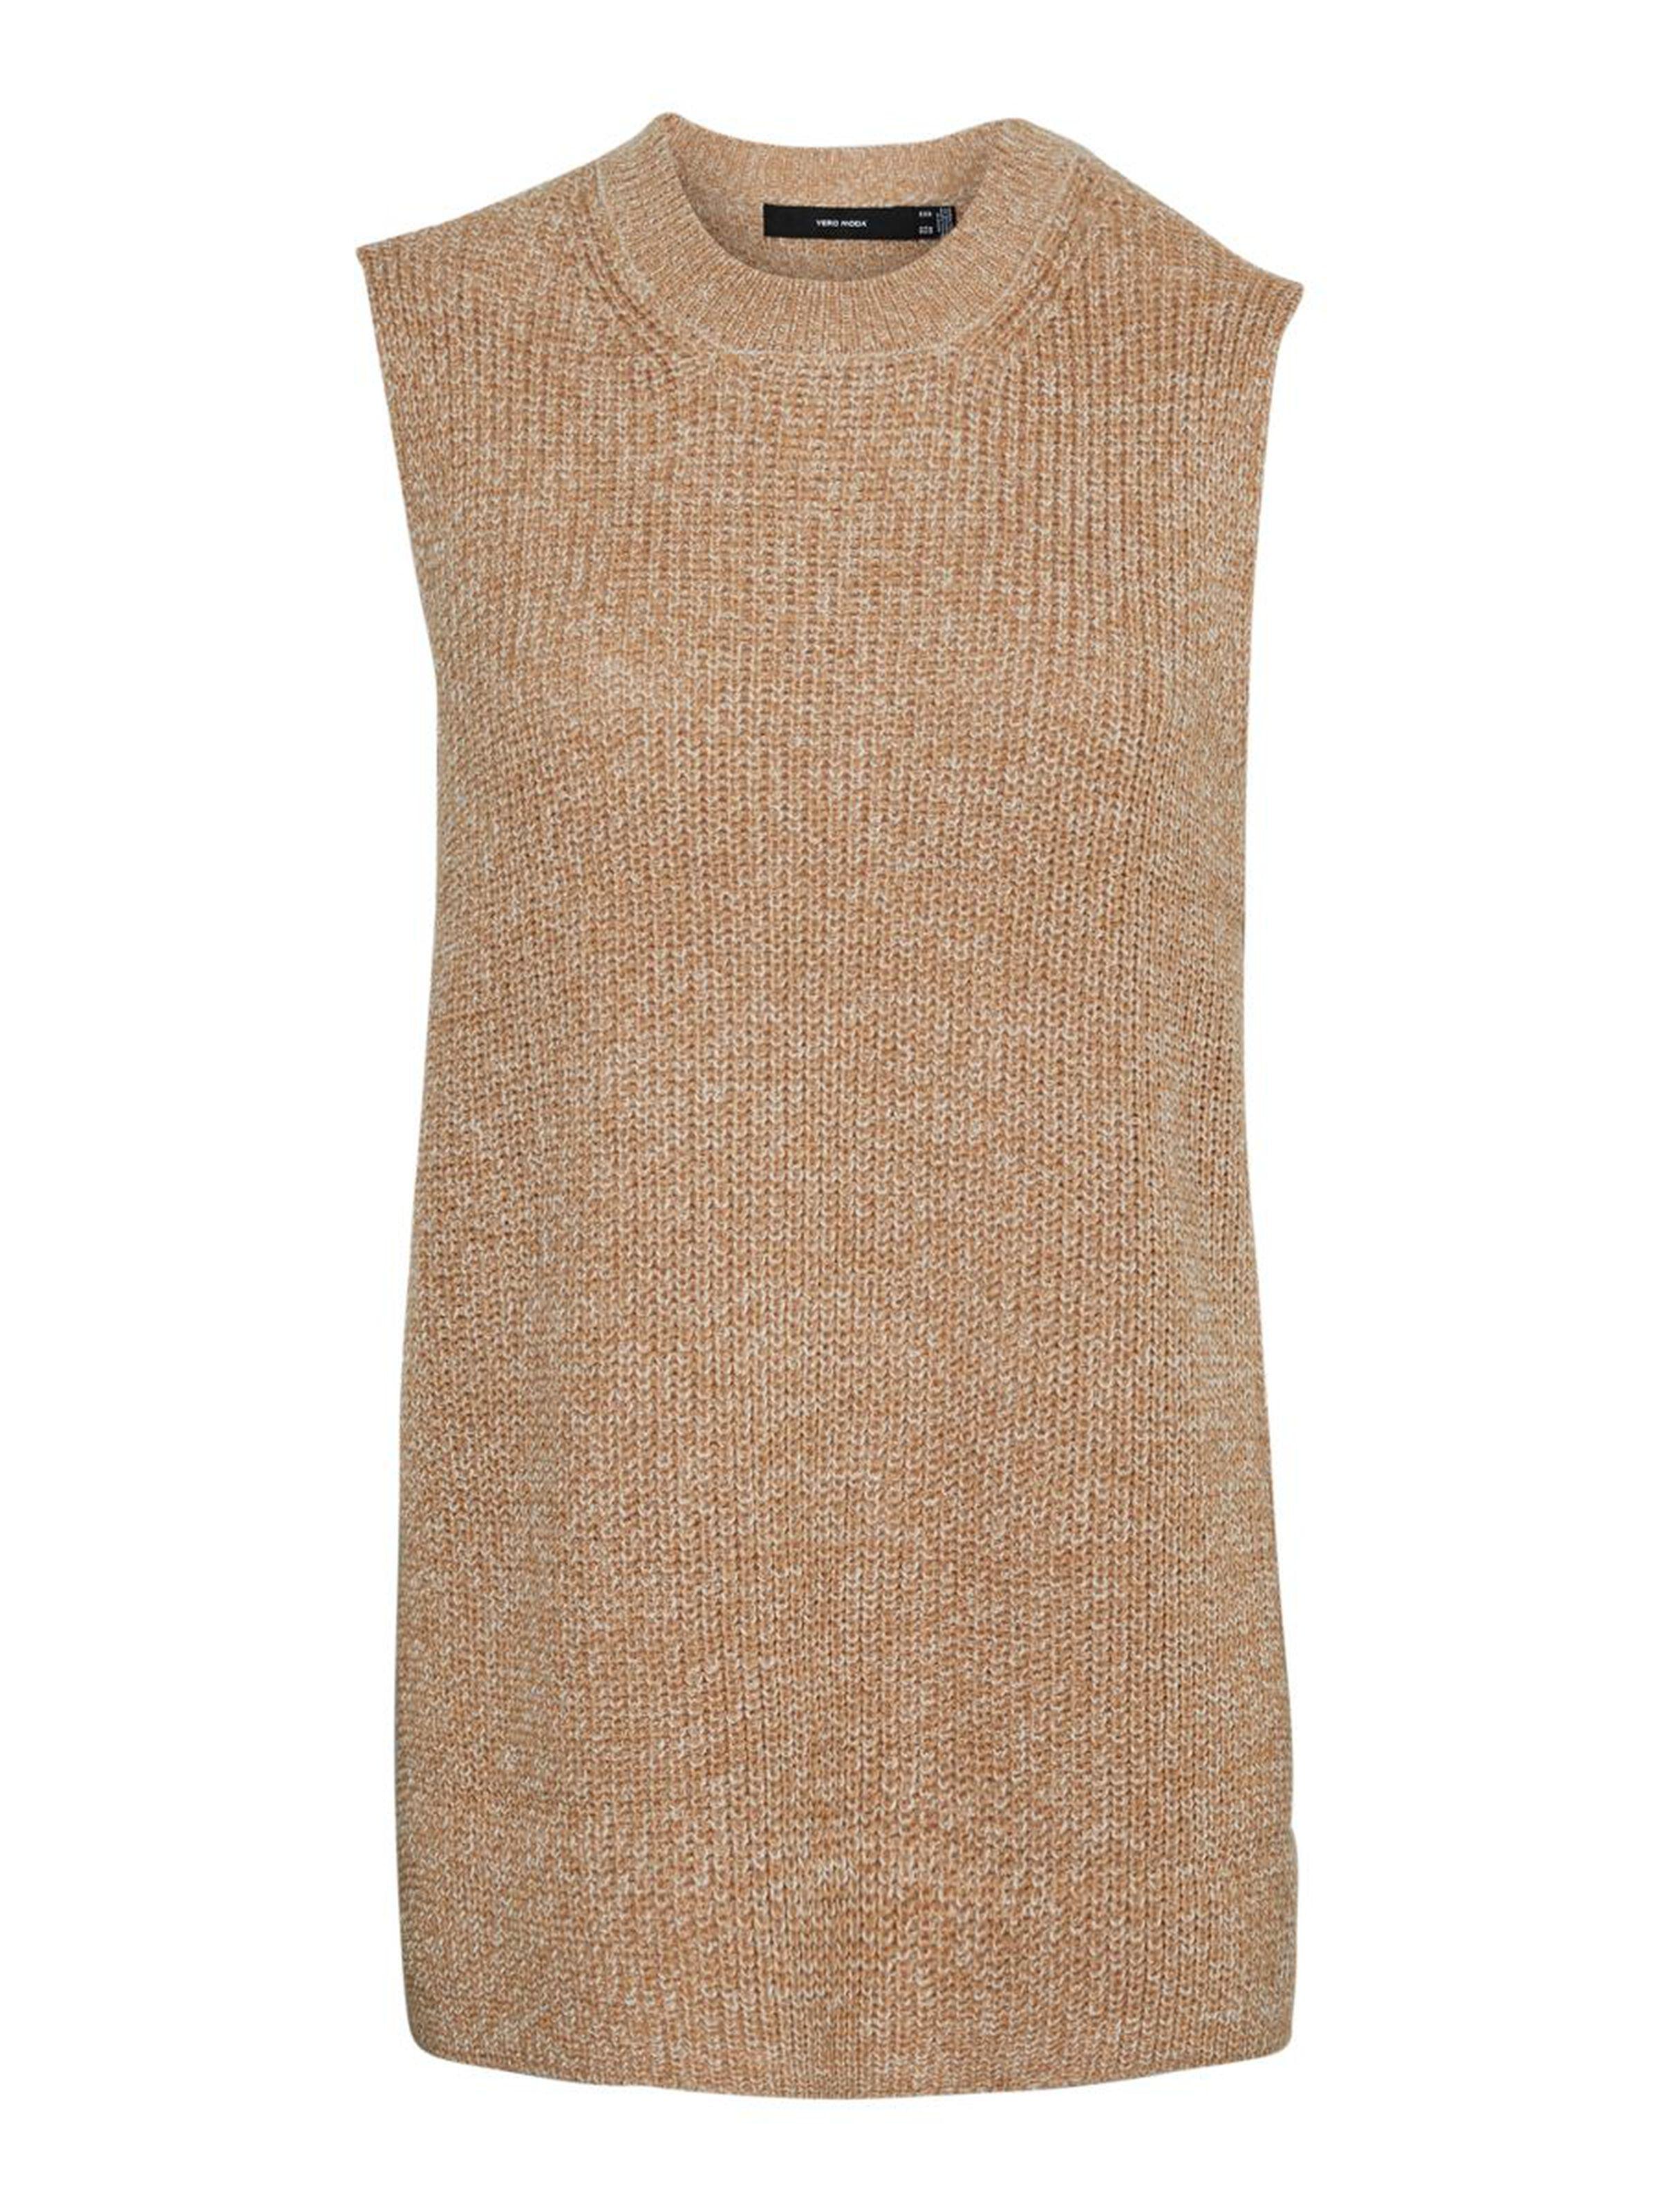 Vero Moda dámská pletená vesta Lea béžová